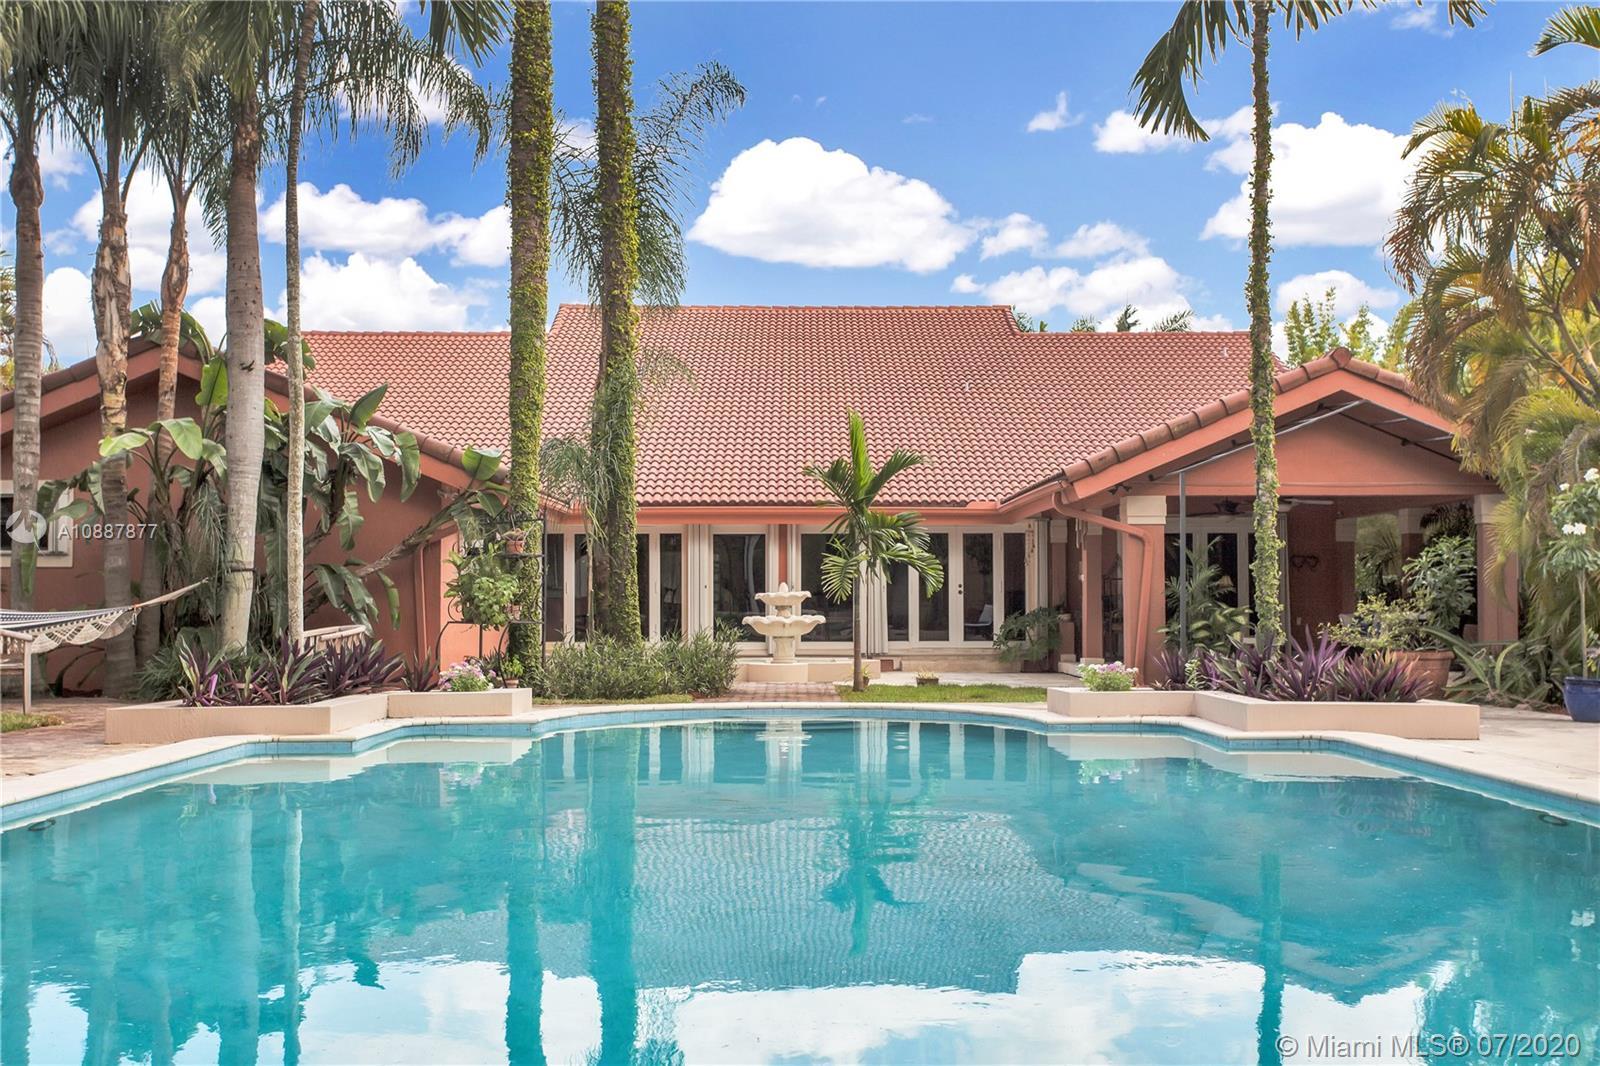 13771 SW 38th St Property Photo - Miami, FL real estate listing